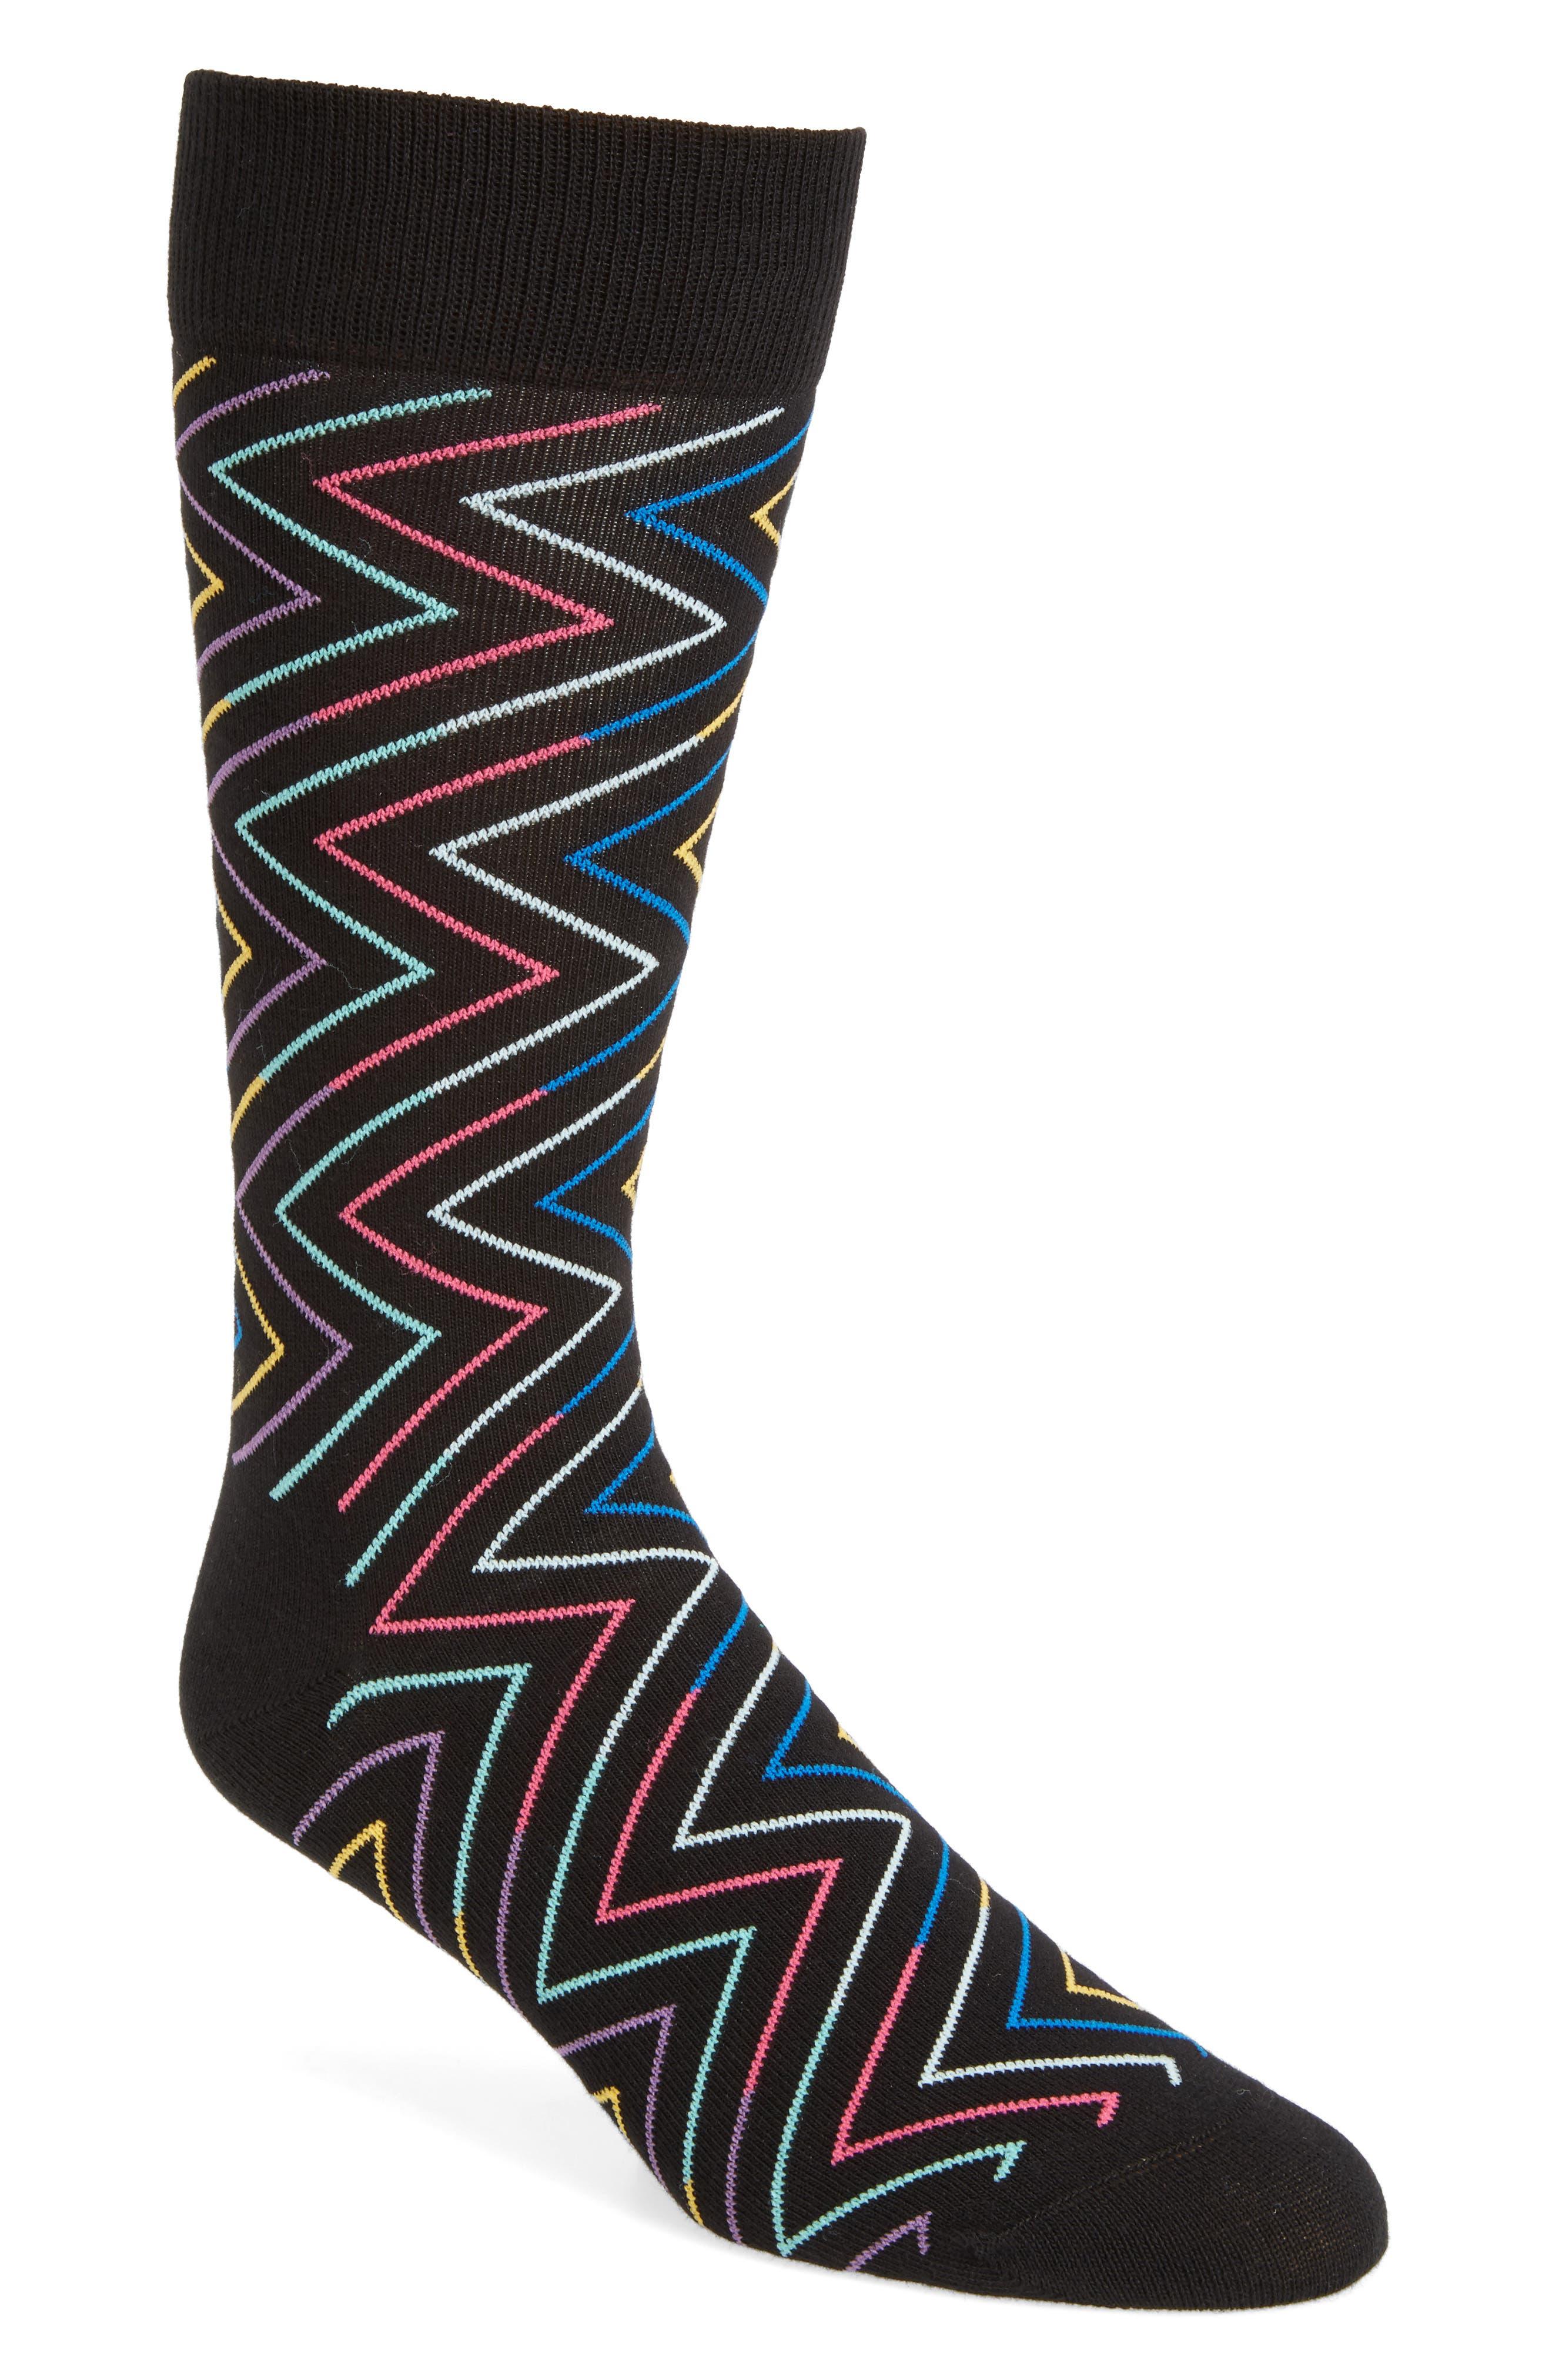 Happy Socks Ziggy Socks